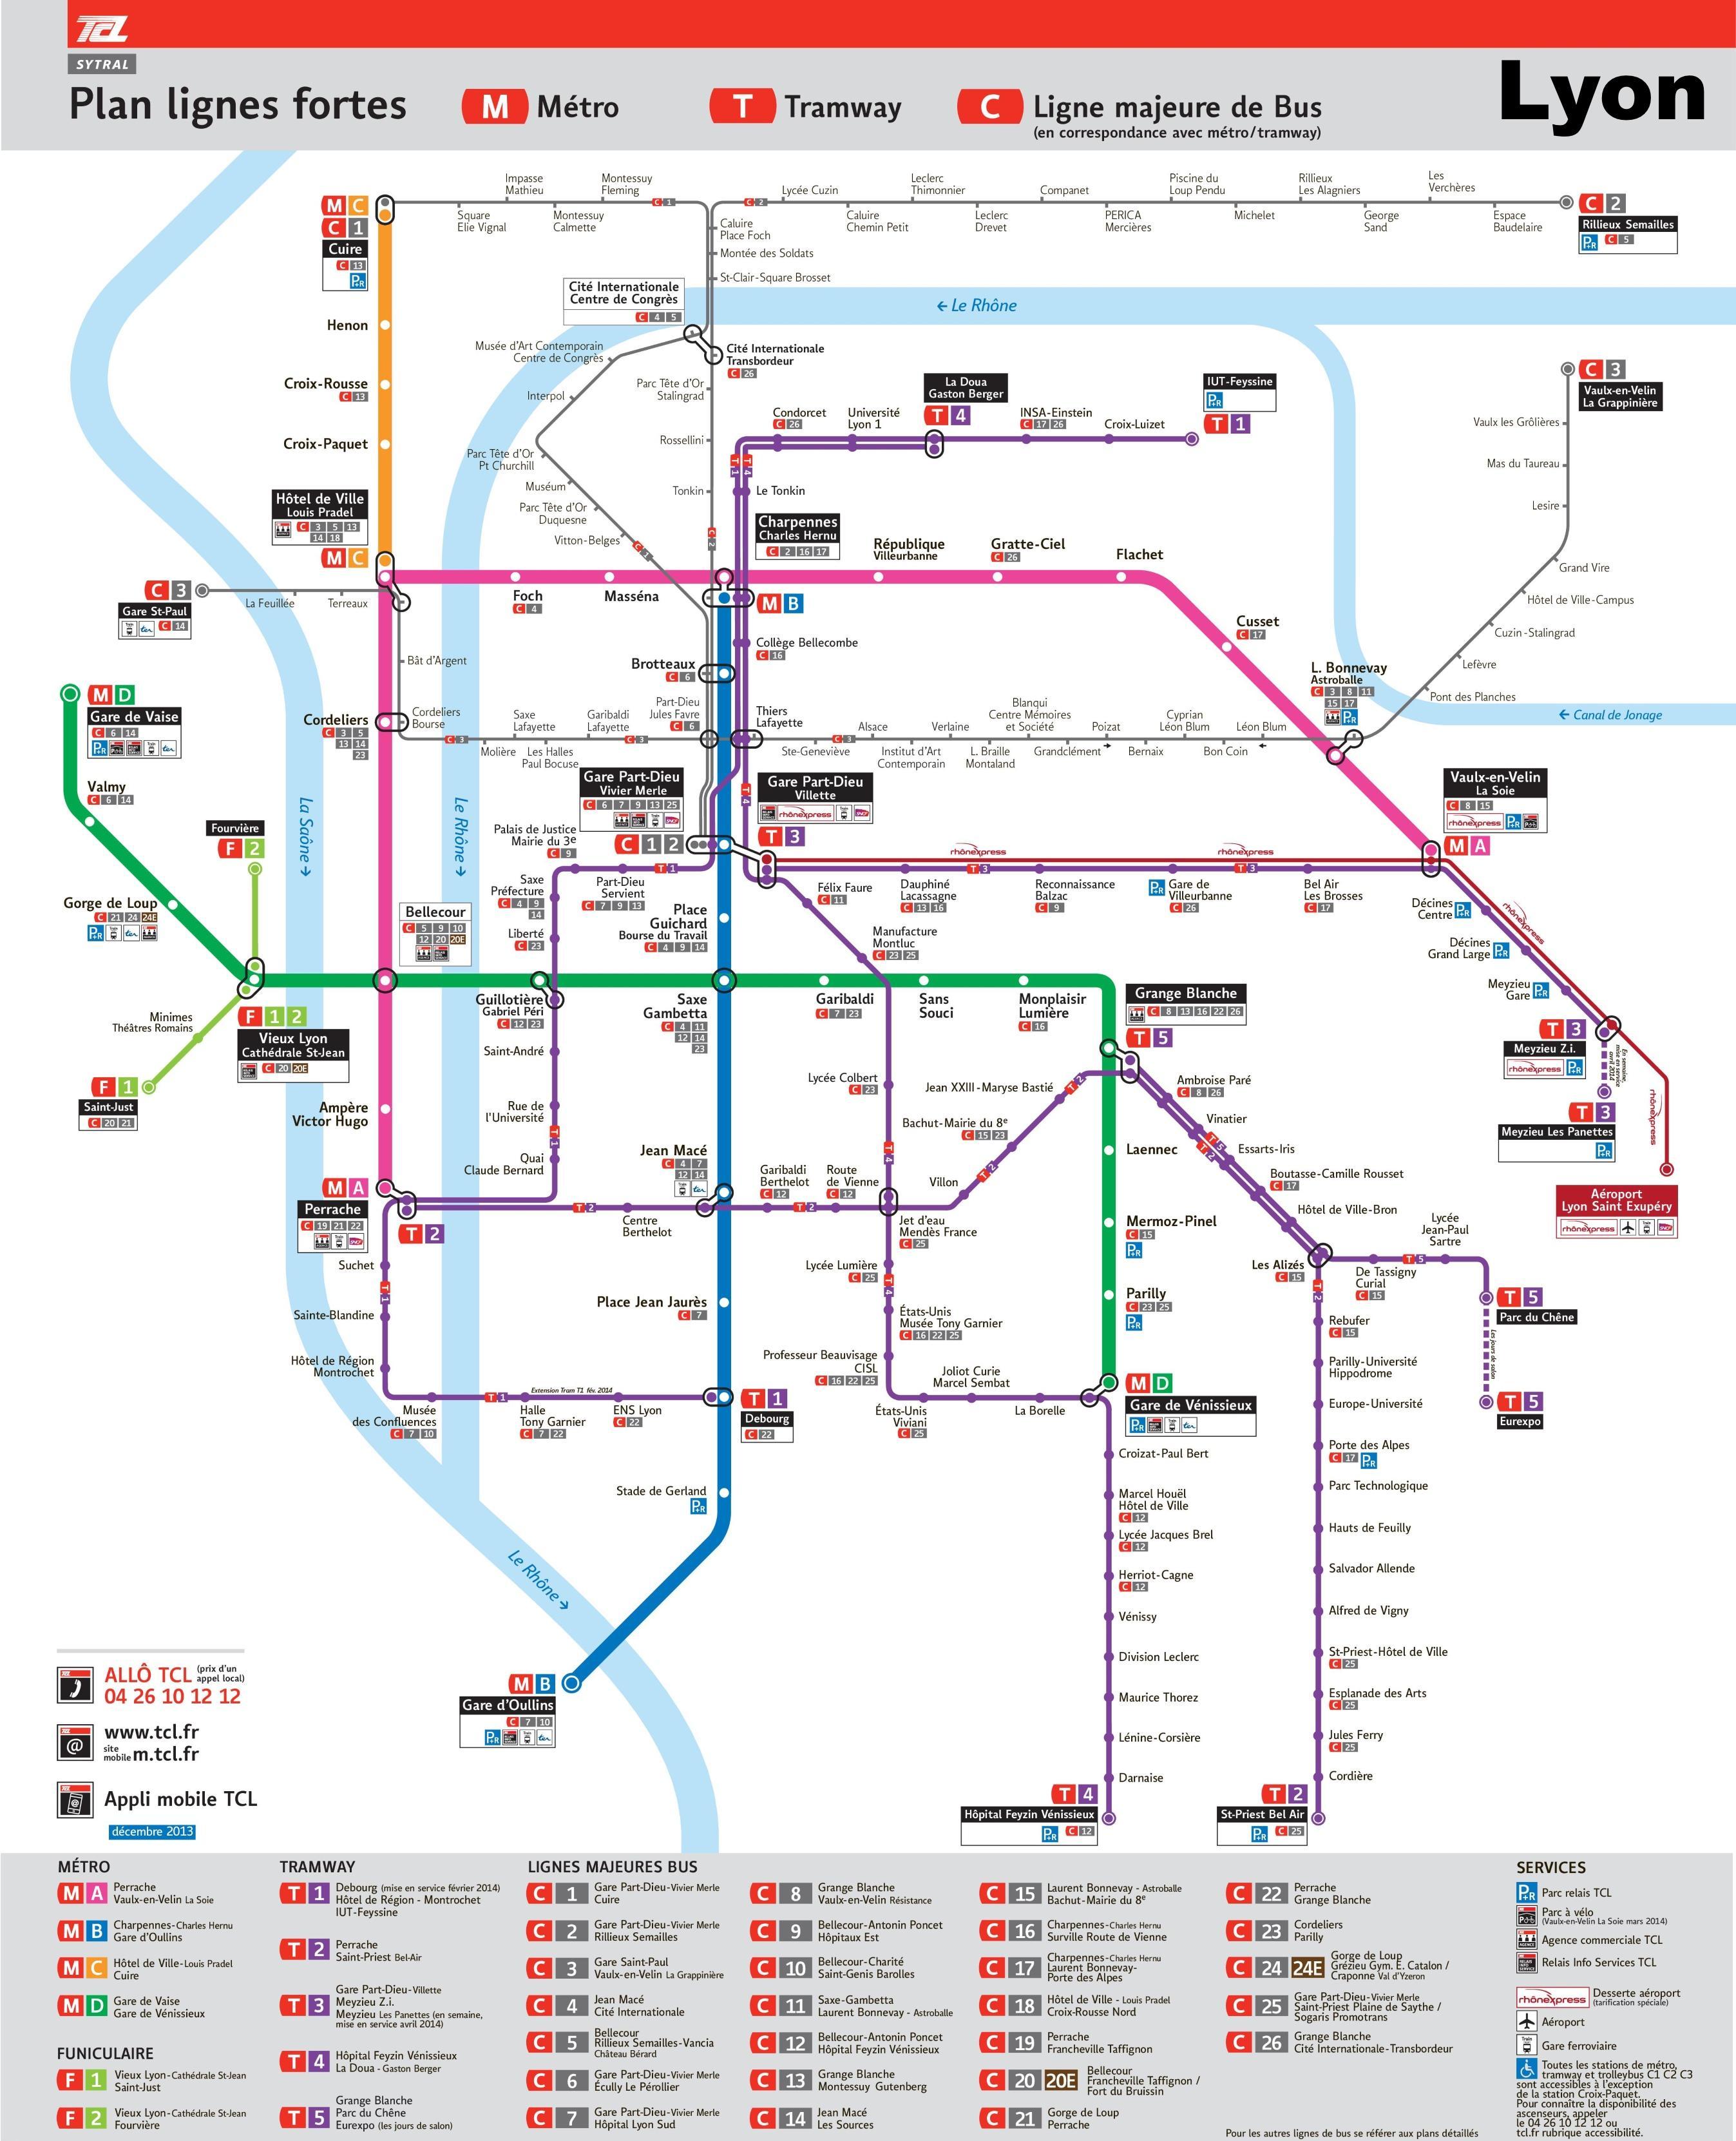 Lyon transport map Lyon transport map pdf AuvergneRhneAlpes